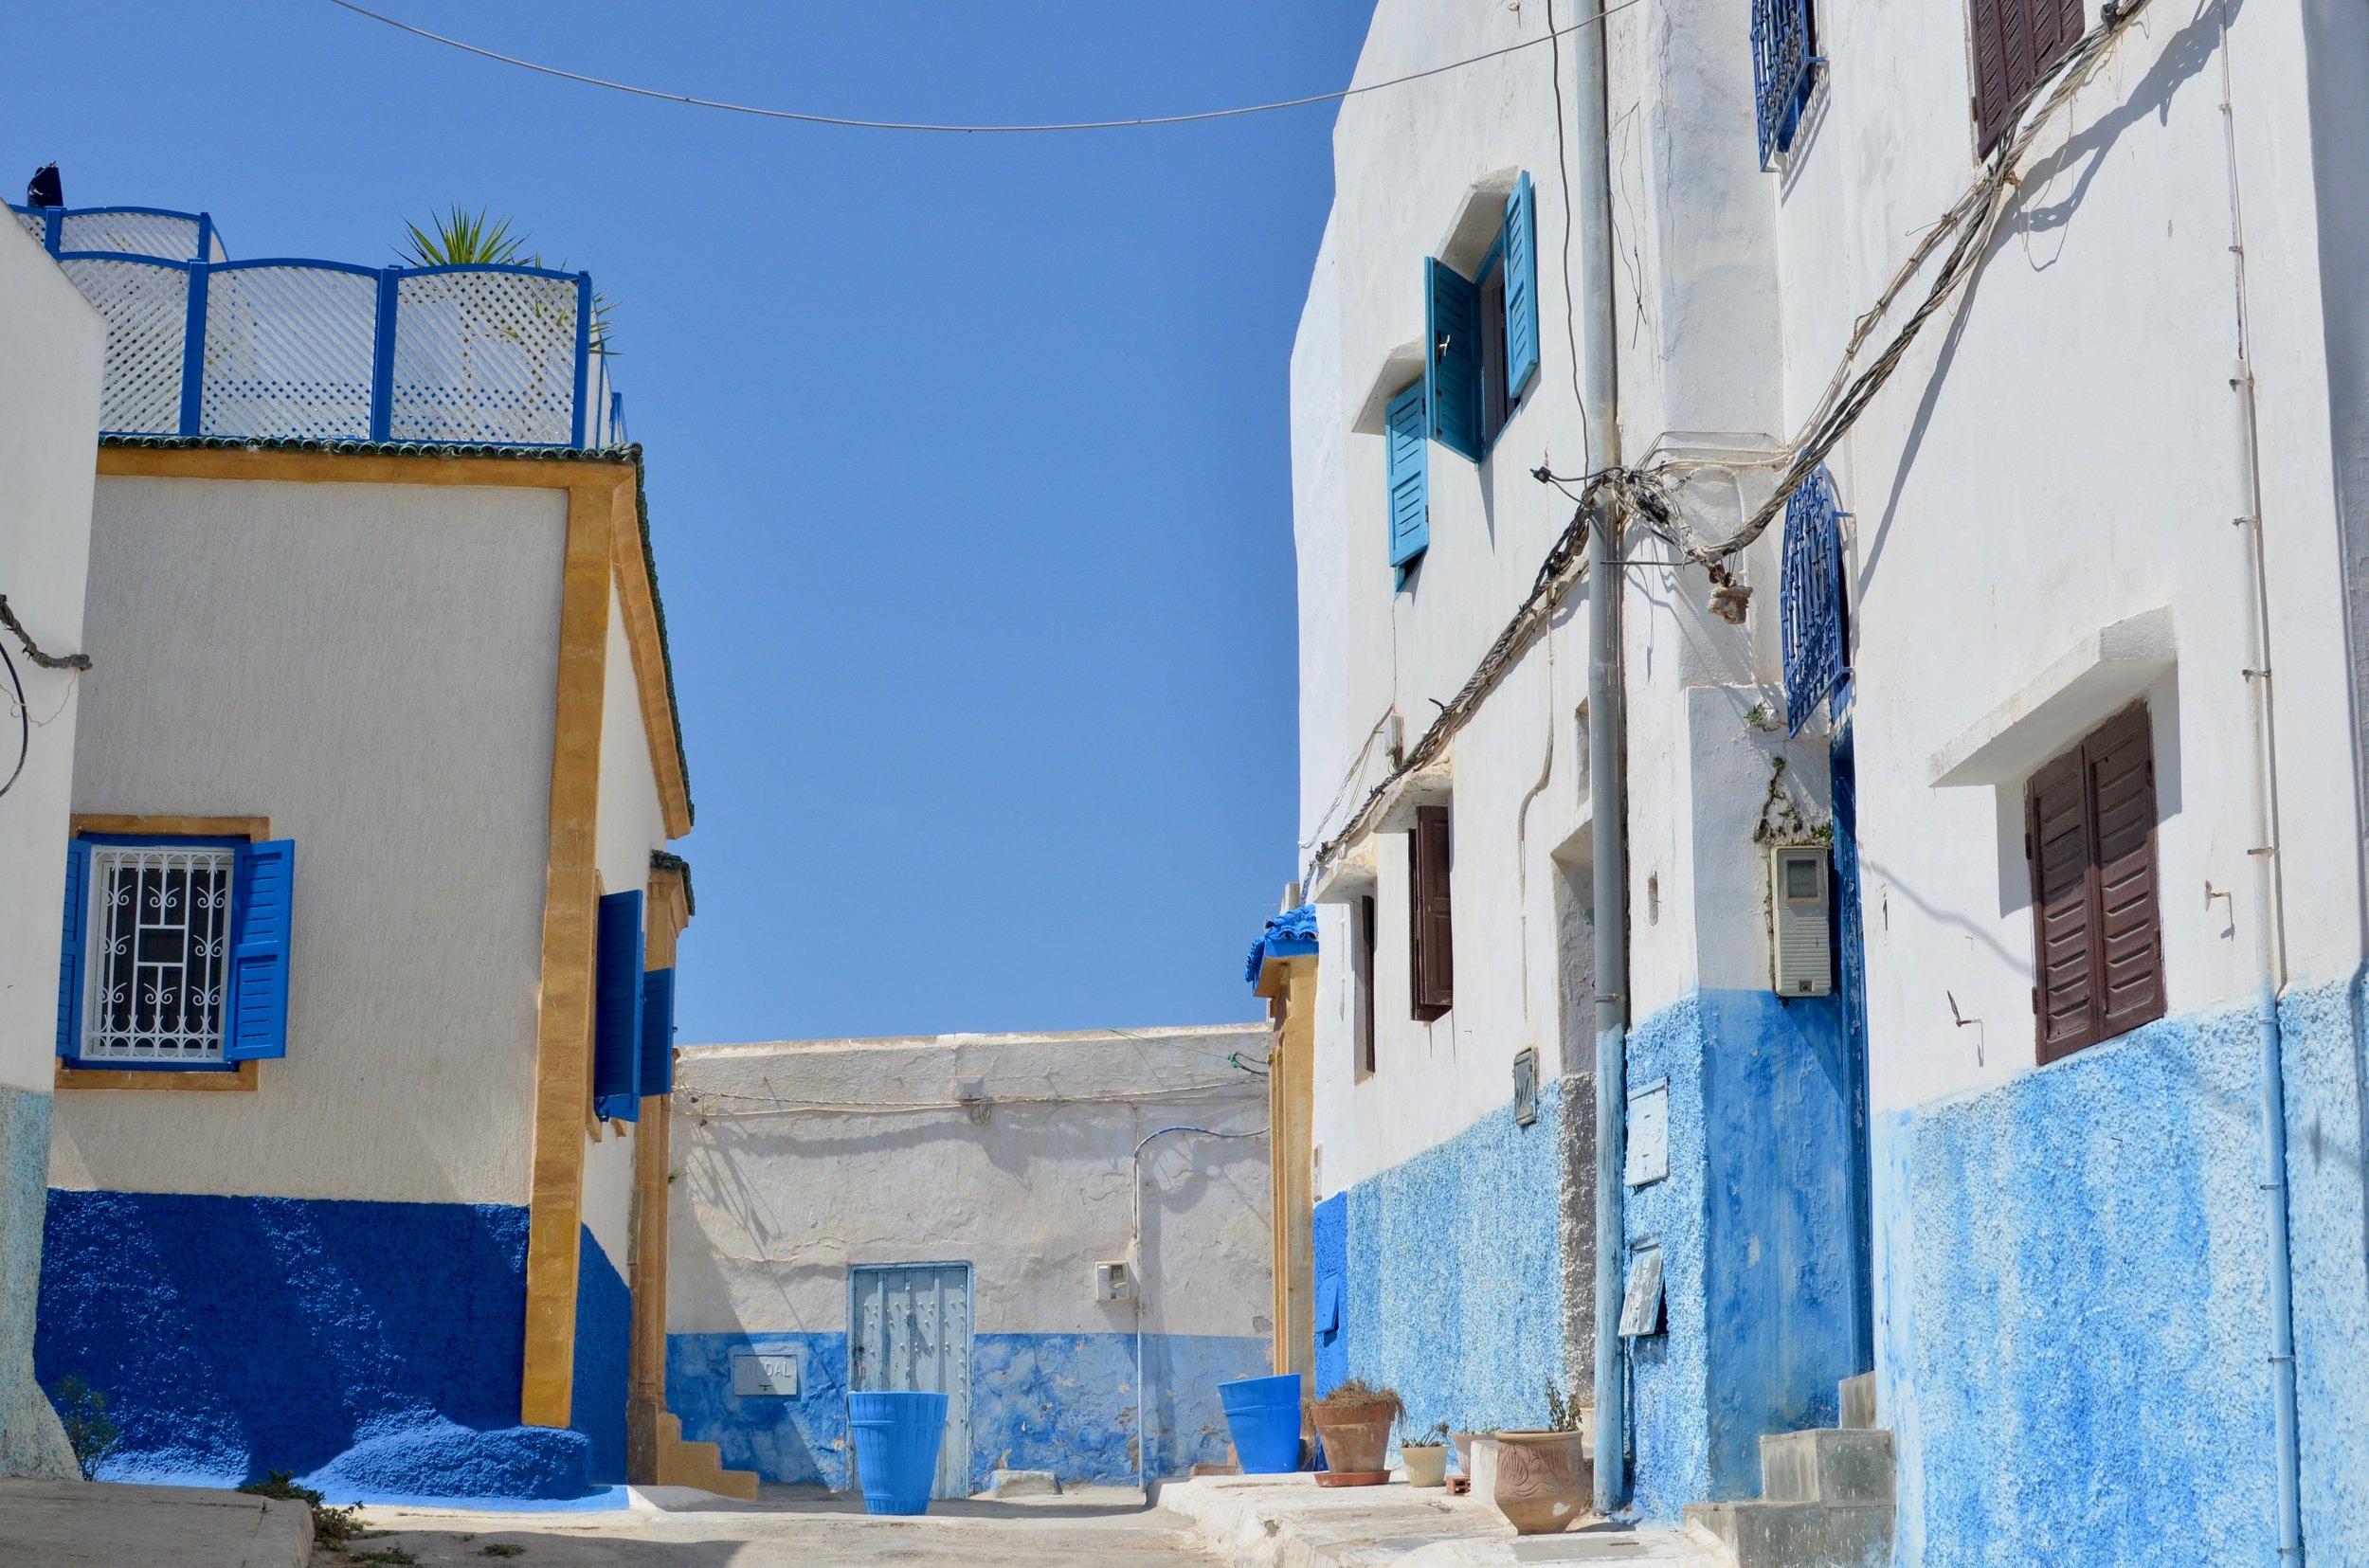 bluetiful Rabat